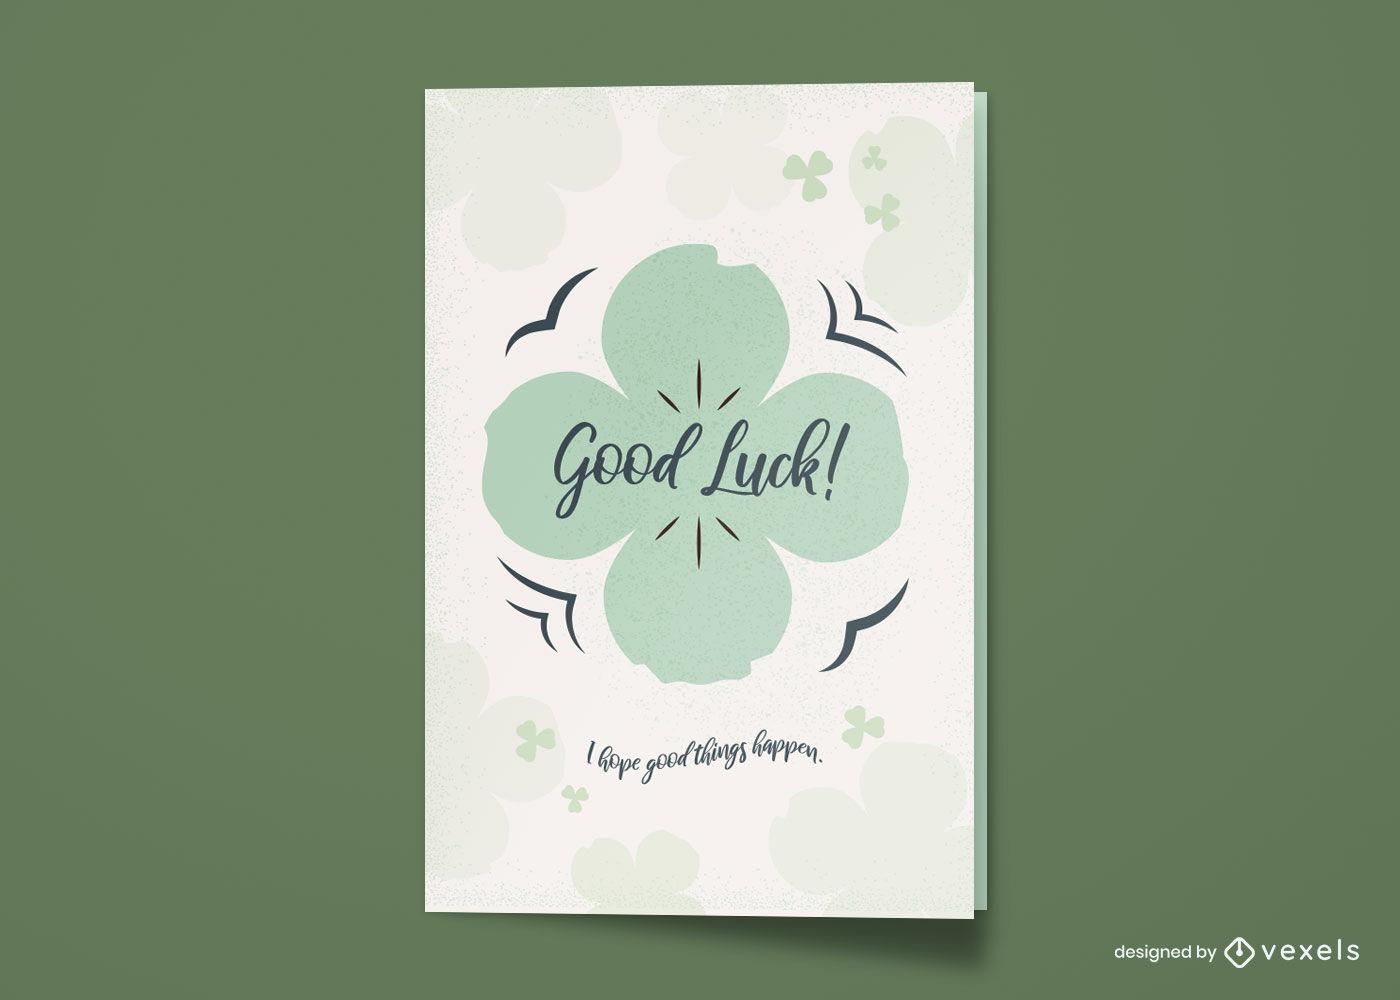 Four leaf clover good luck greeting card